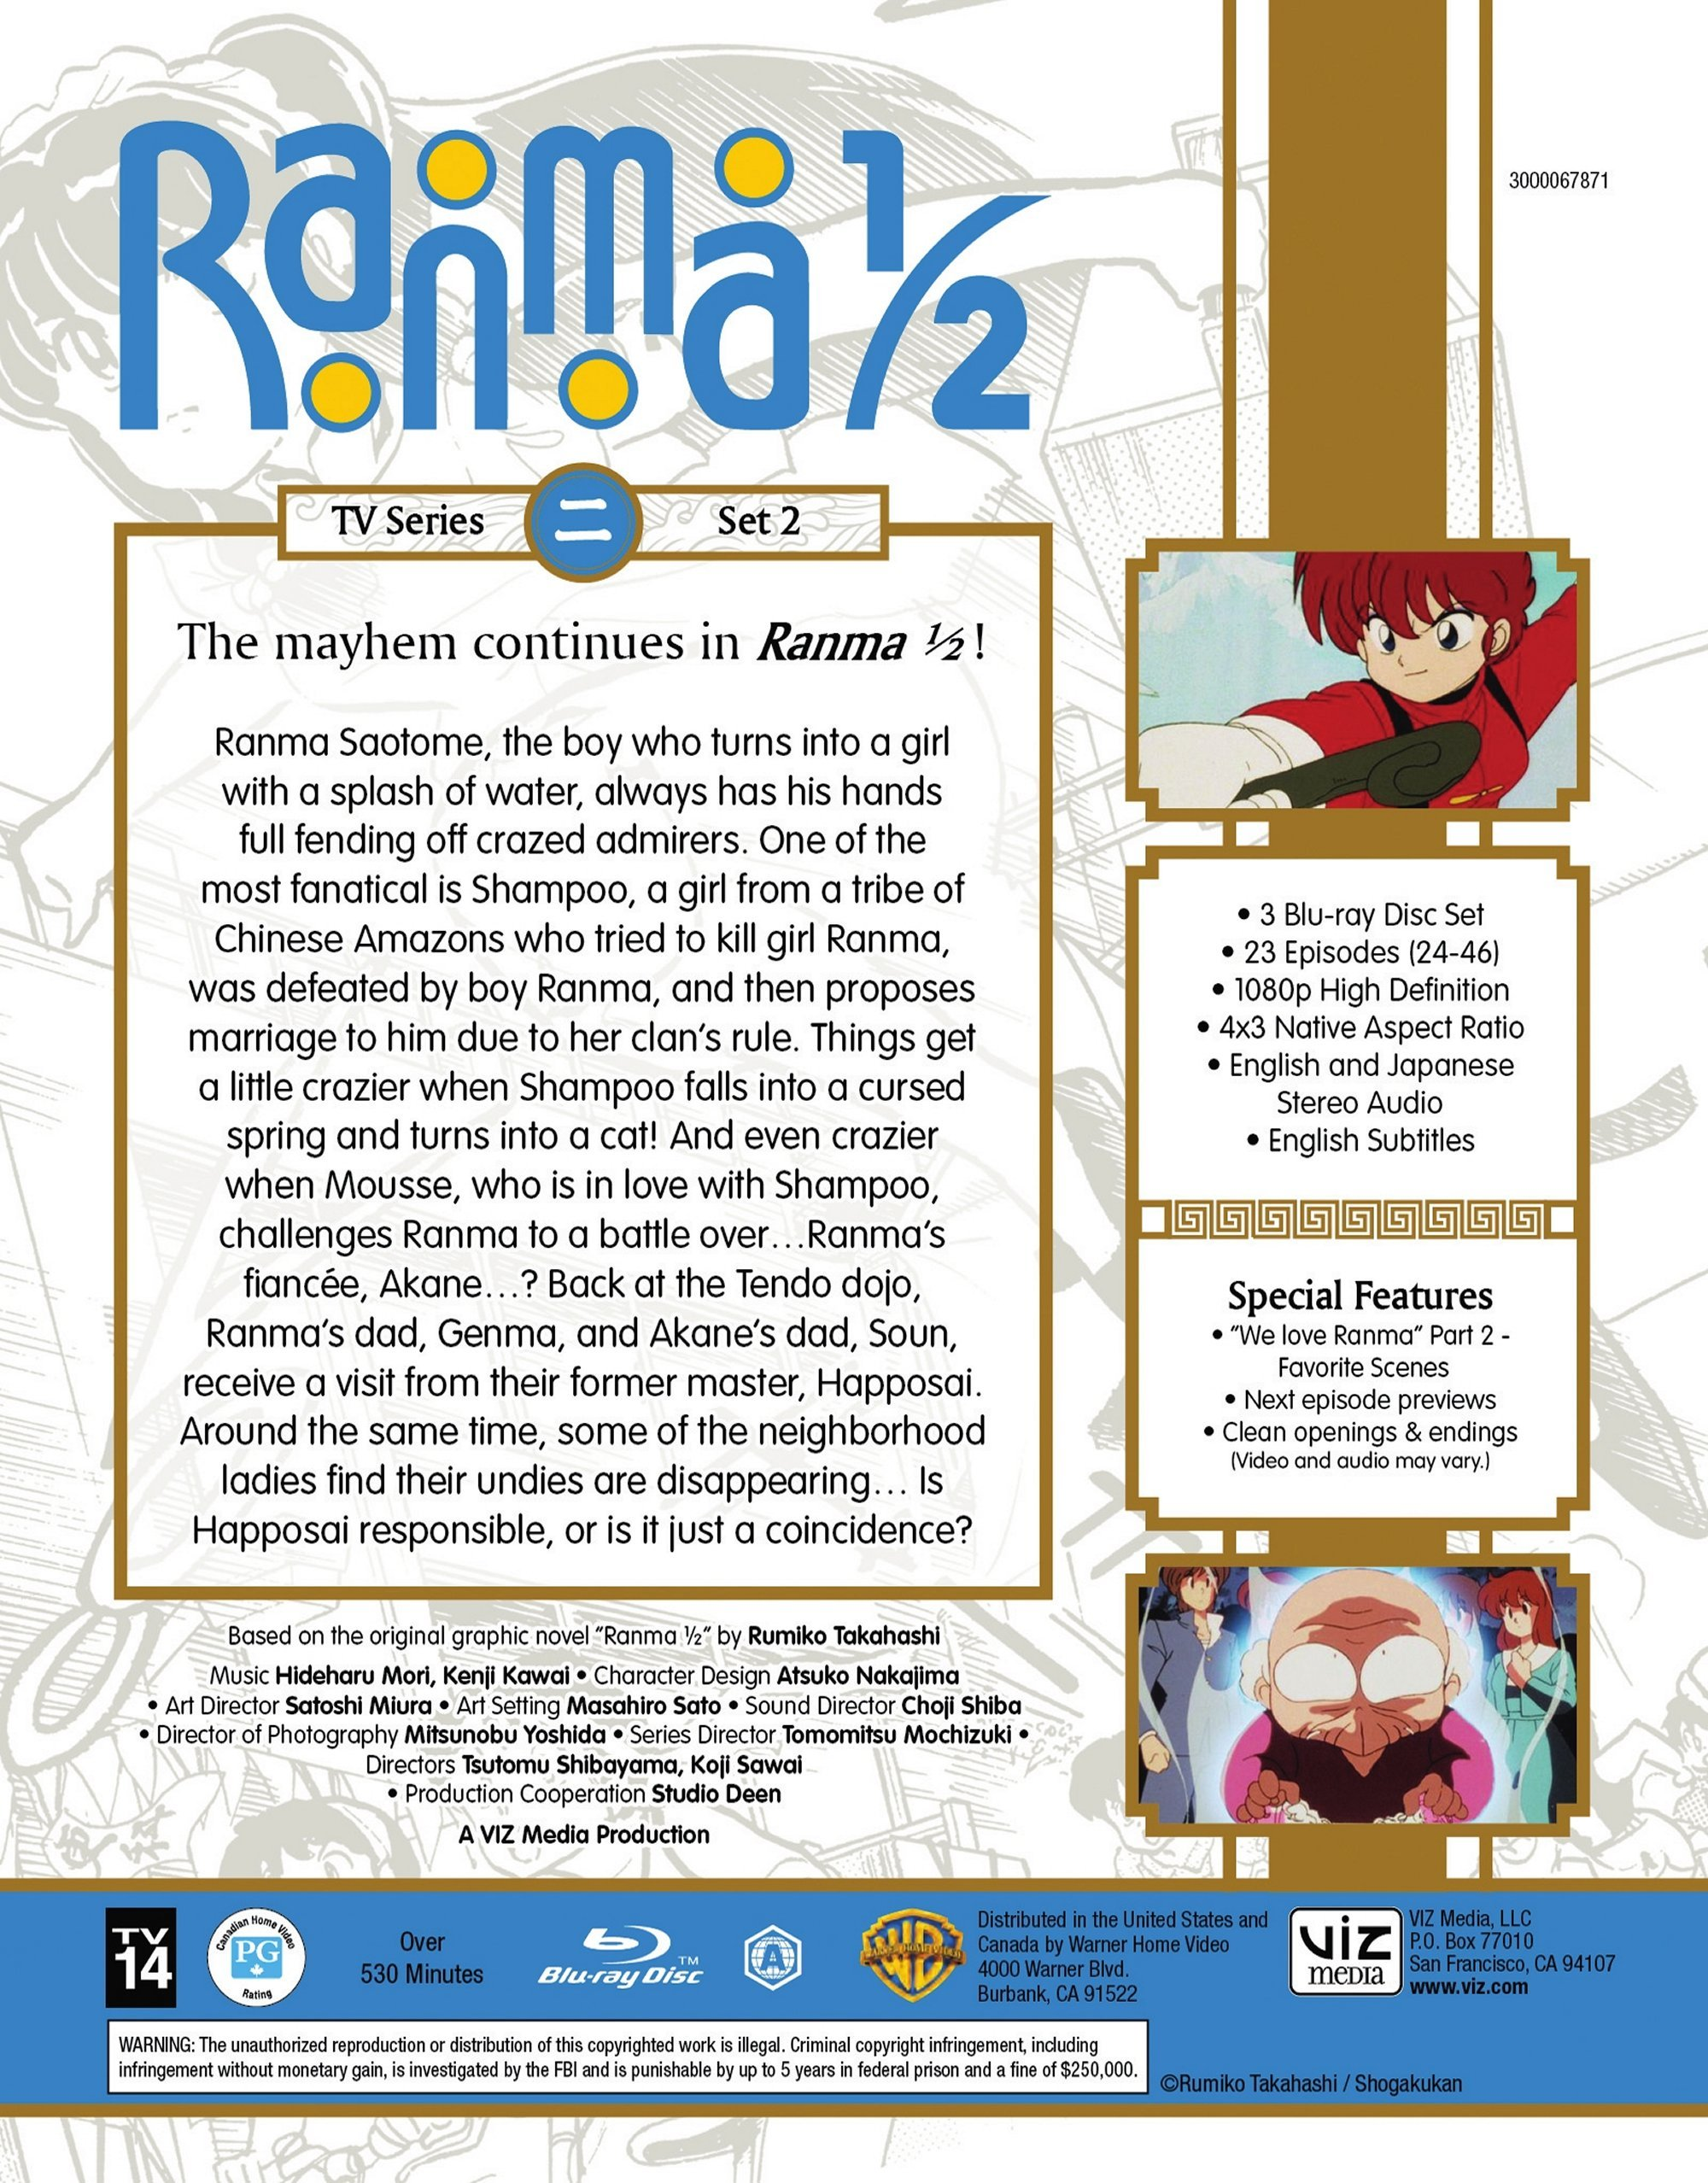 Ranma 1/2 - TV Series Set 2 BD Standard Edition [Blu-ray]